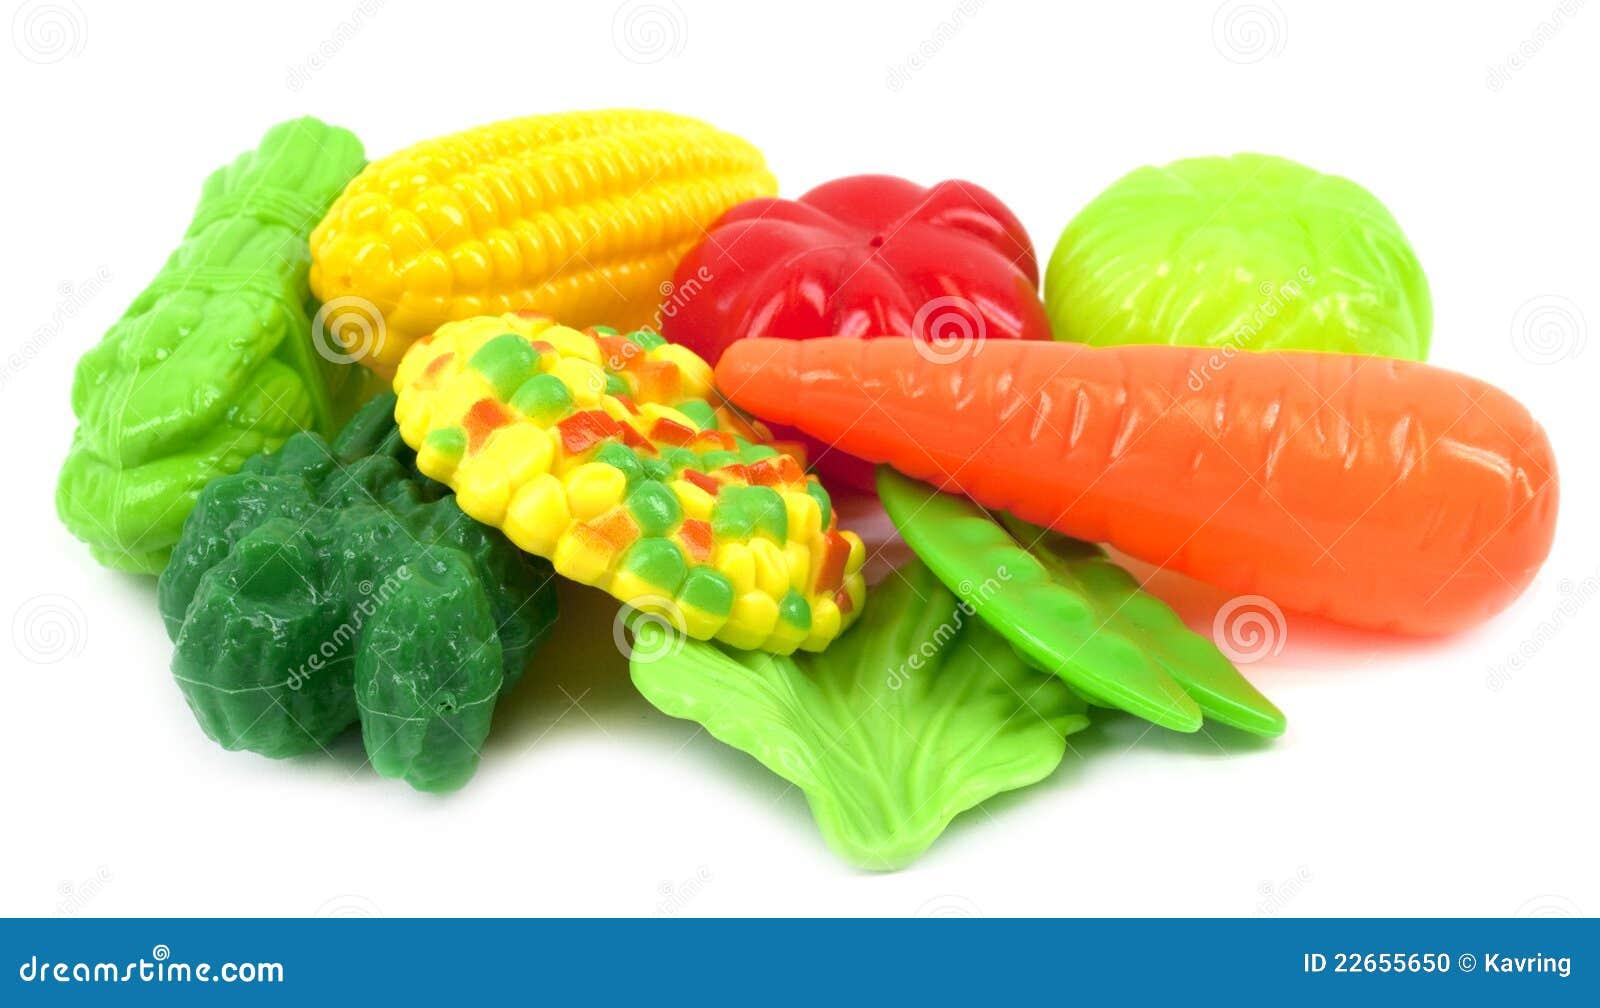 Plastic Vegetables Stock Photo Image 22655650